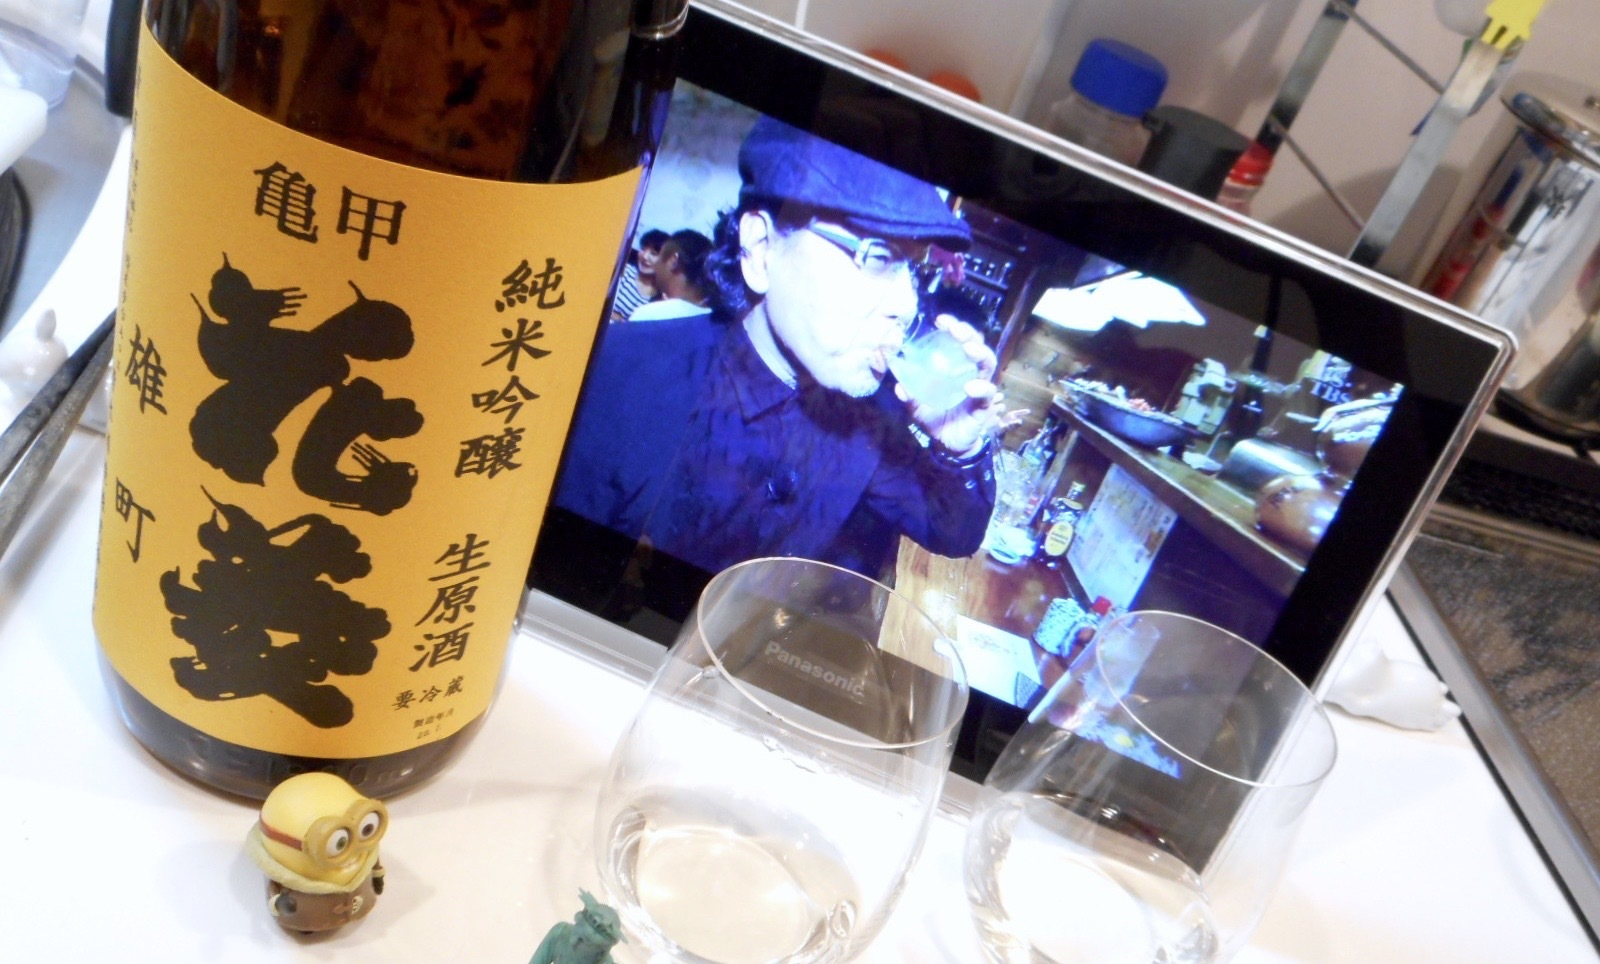 hanabishi_jungin_omachi27by13.jpg